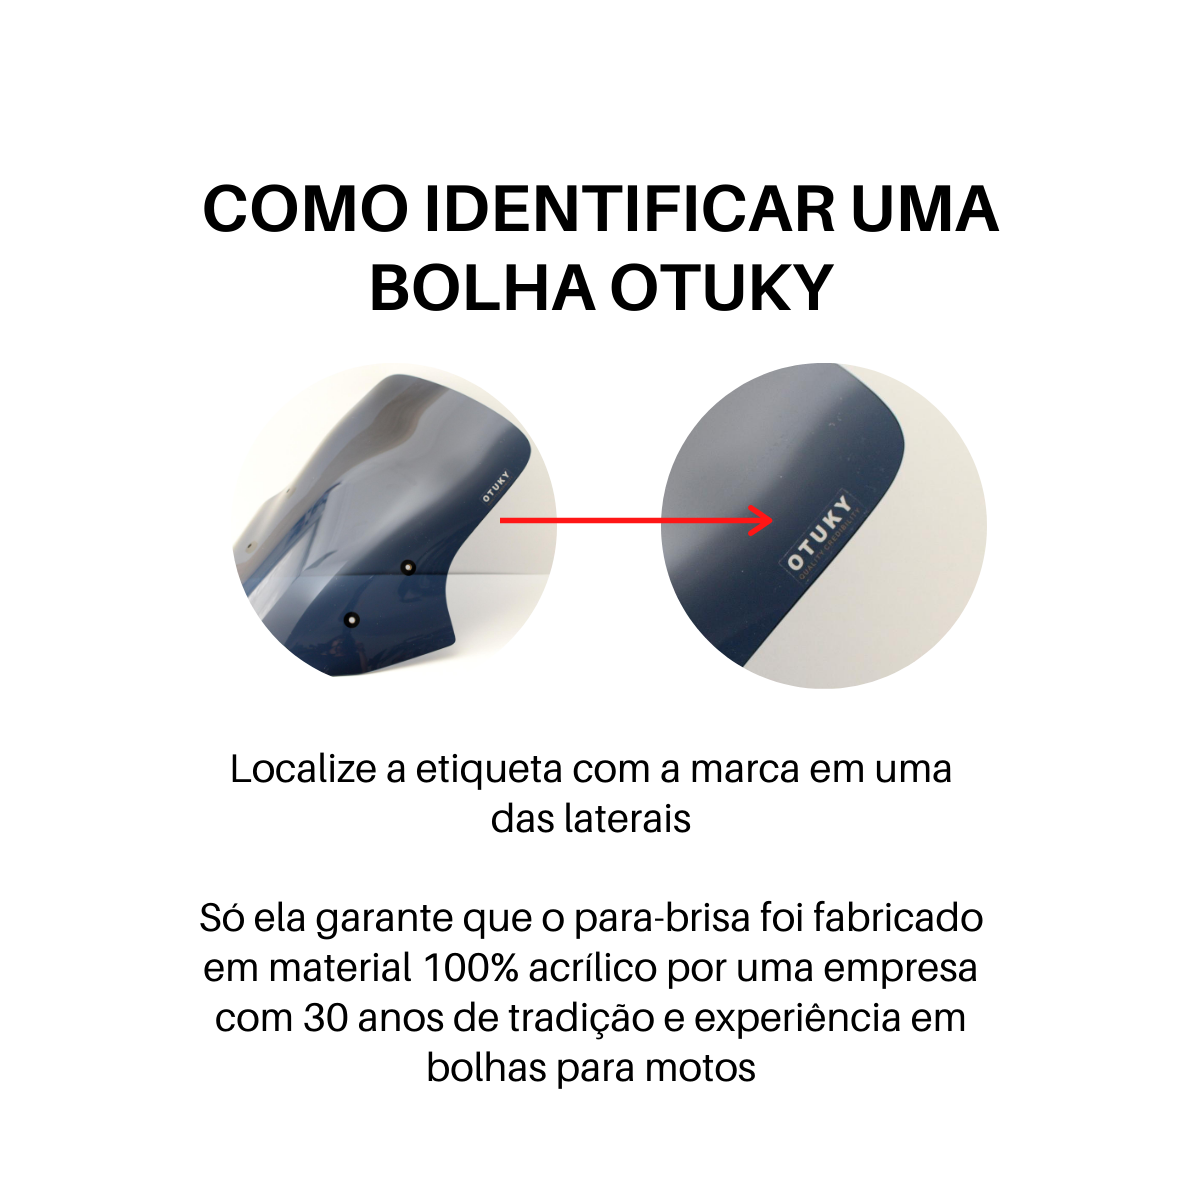 Bolha para Moto Nmax 160 2017 2018 2019 2020 Otuky Alongada Preto